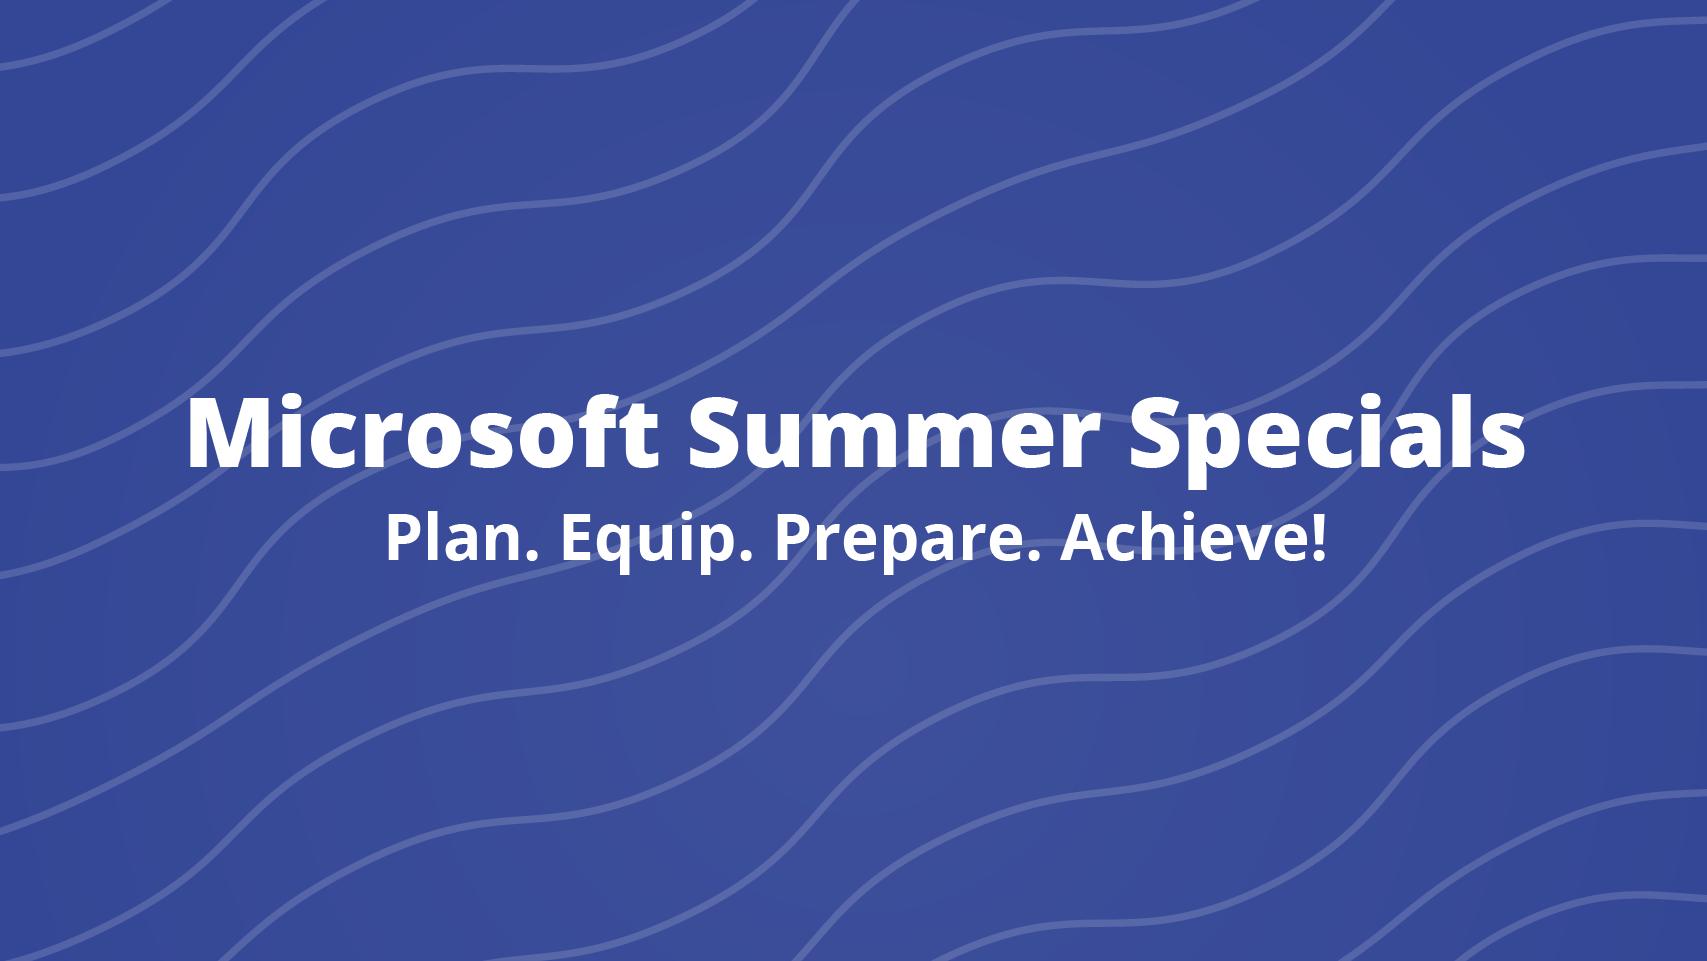 Microsoft Summer Specials